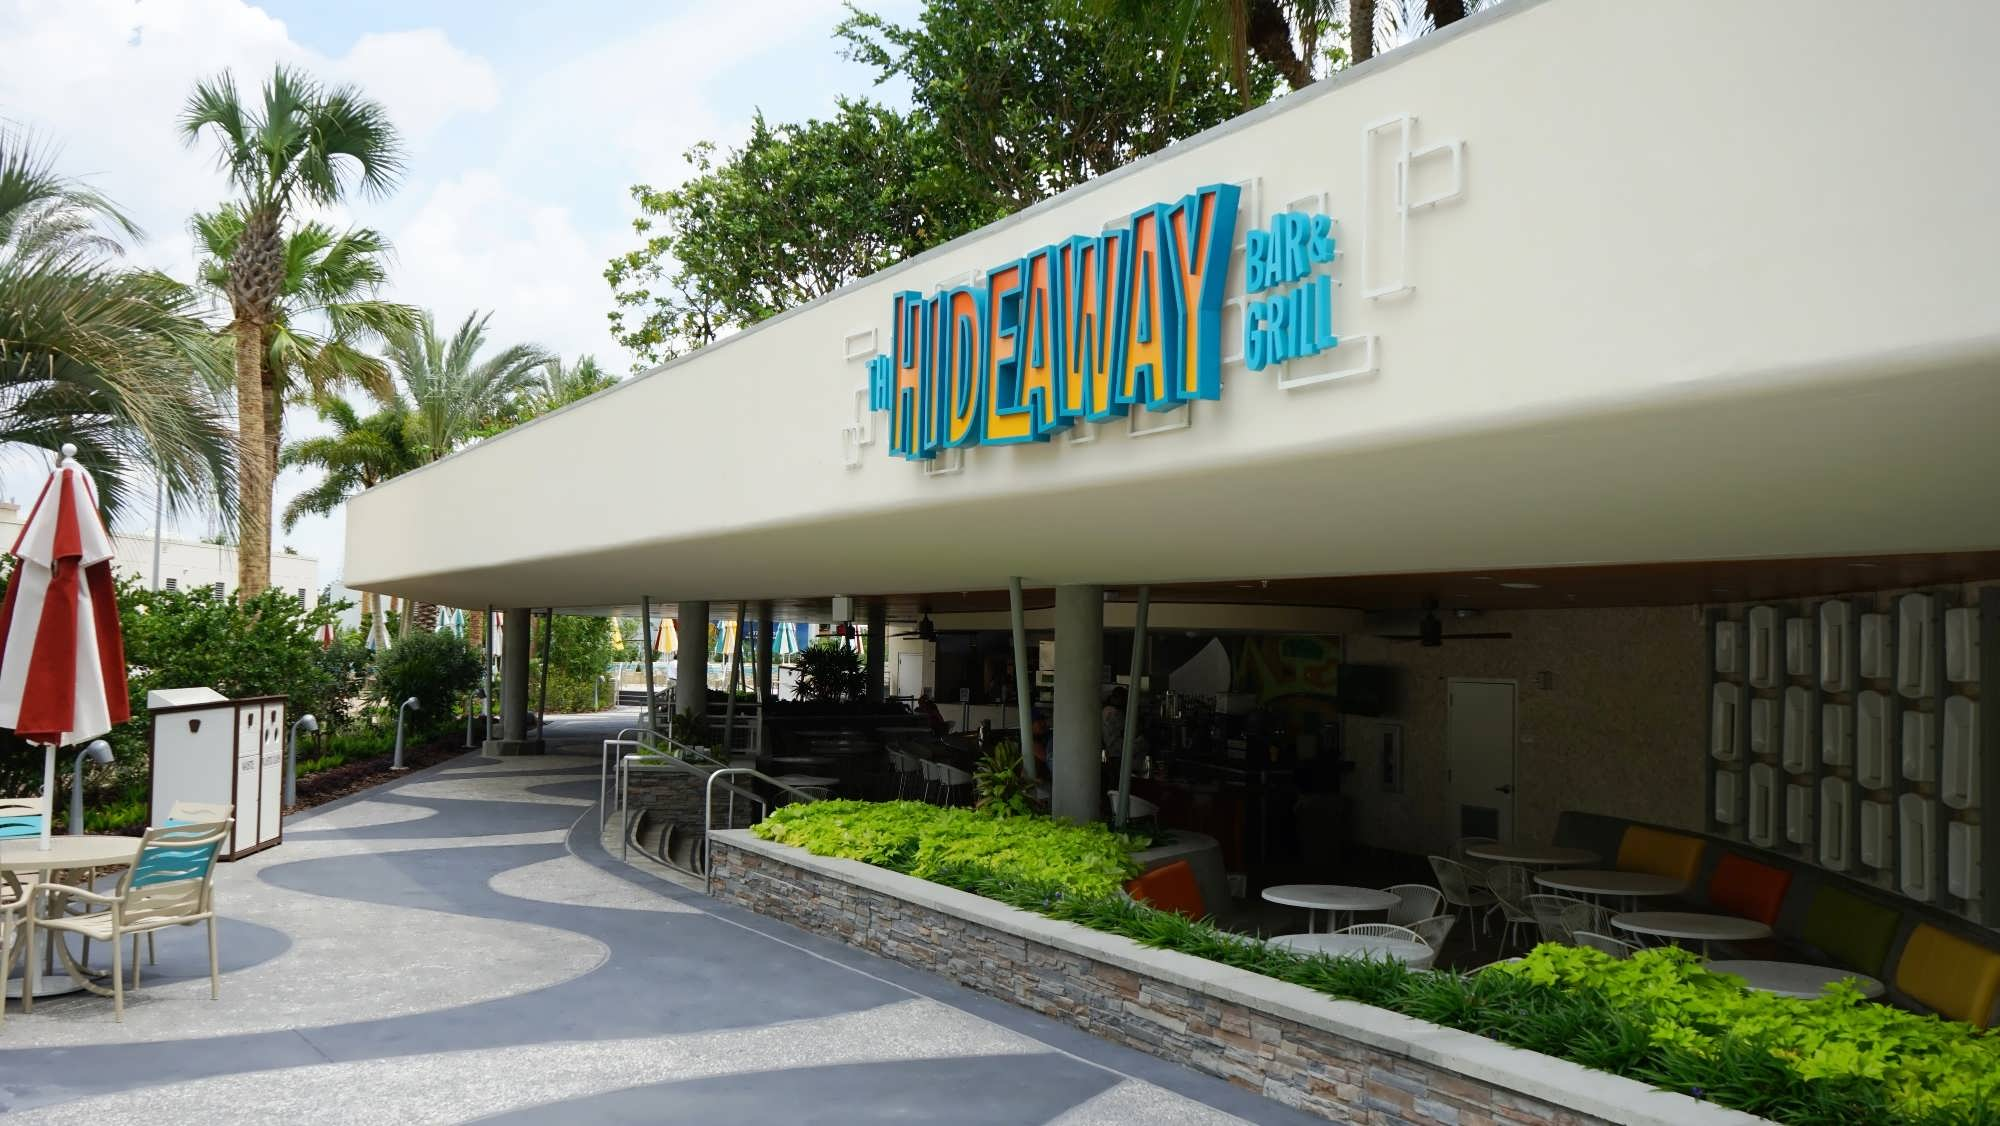 South Courtyard pool area at Cabana Bay Beach Resort